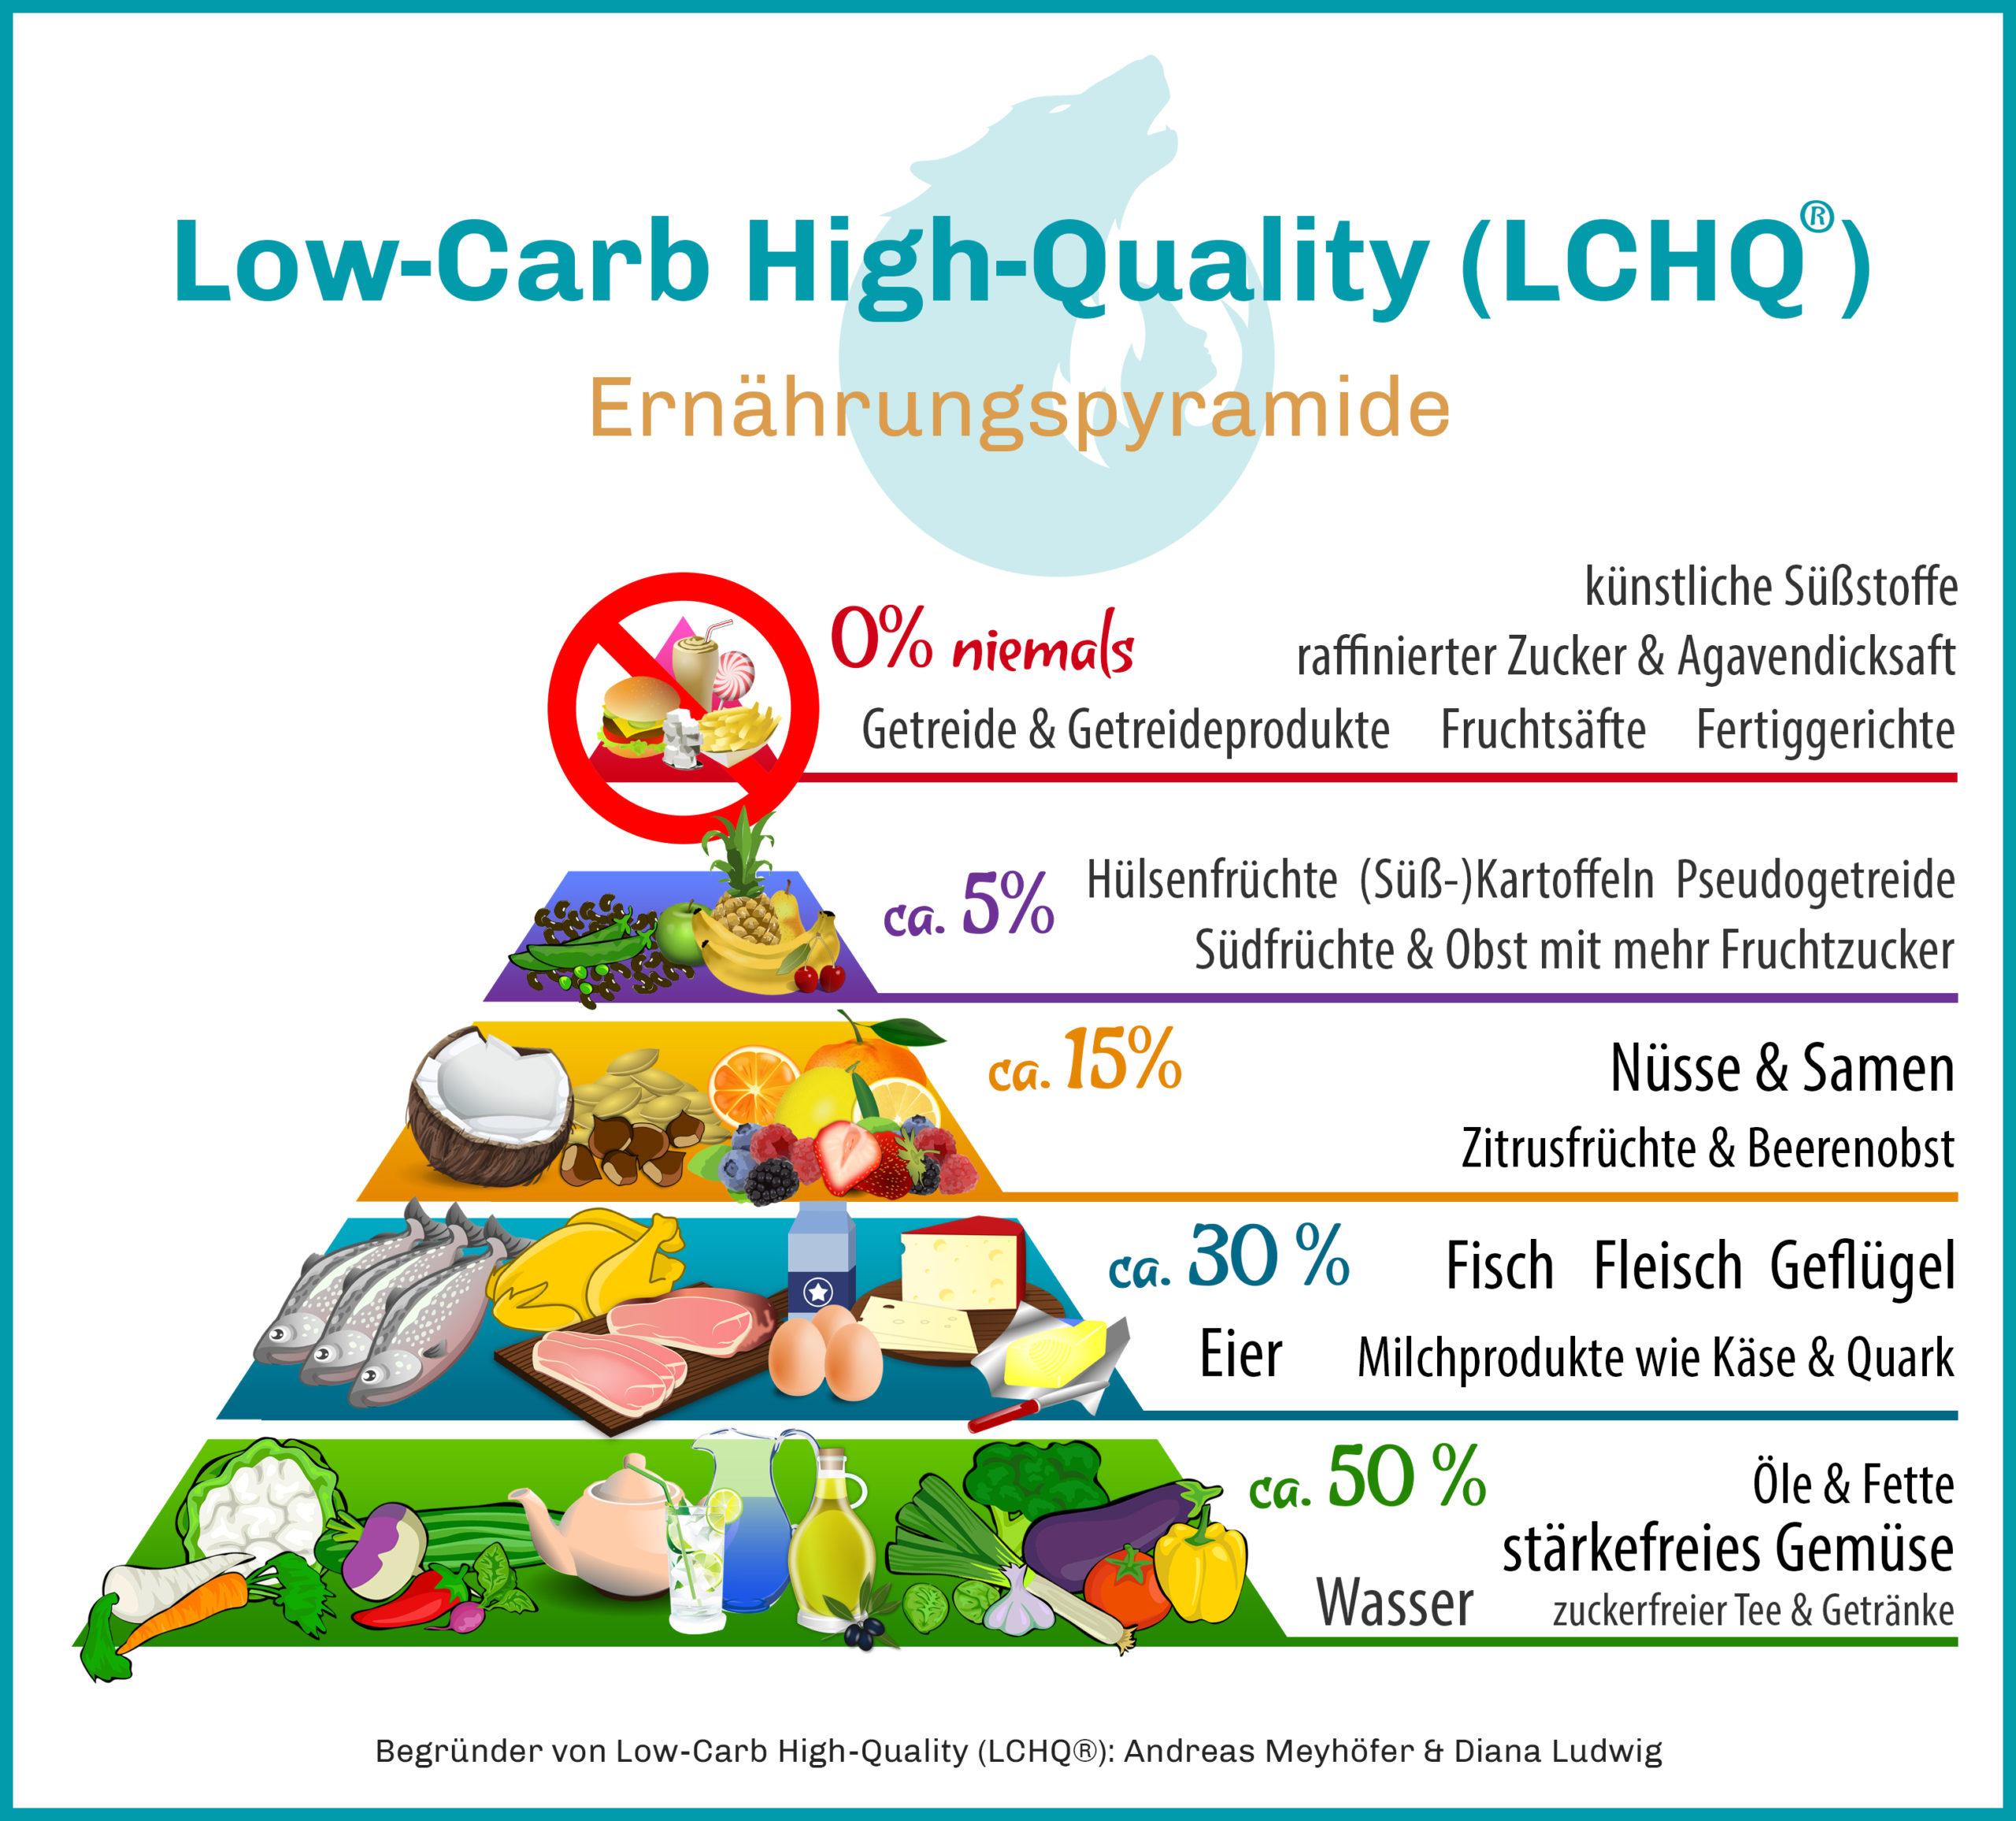 Low-Carb High-Quality (LCHQ®) Ernährungspyramide - Mit smarter Low-Carb Ernährung zum Erfolg